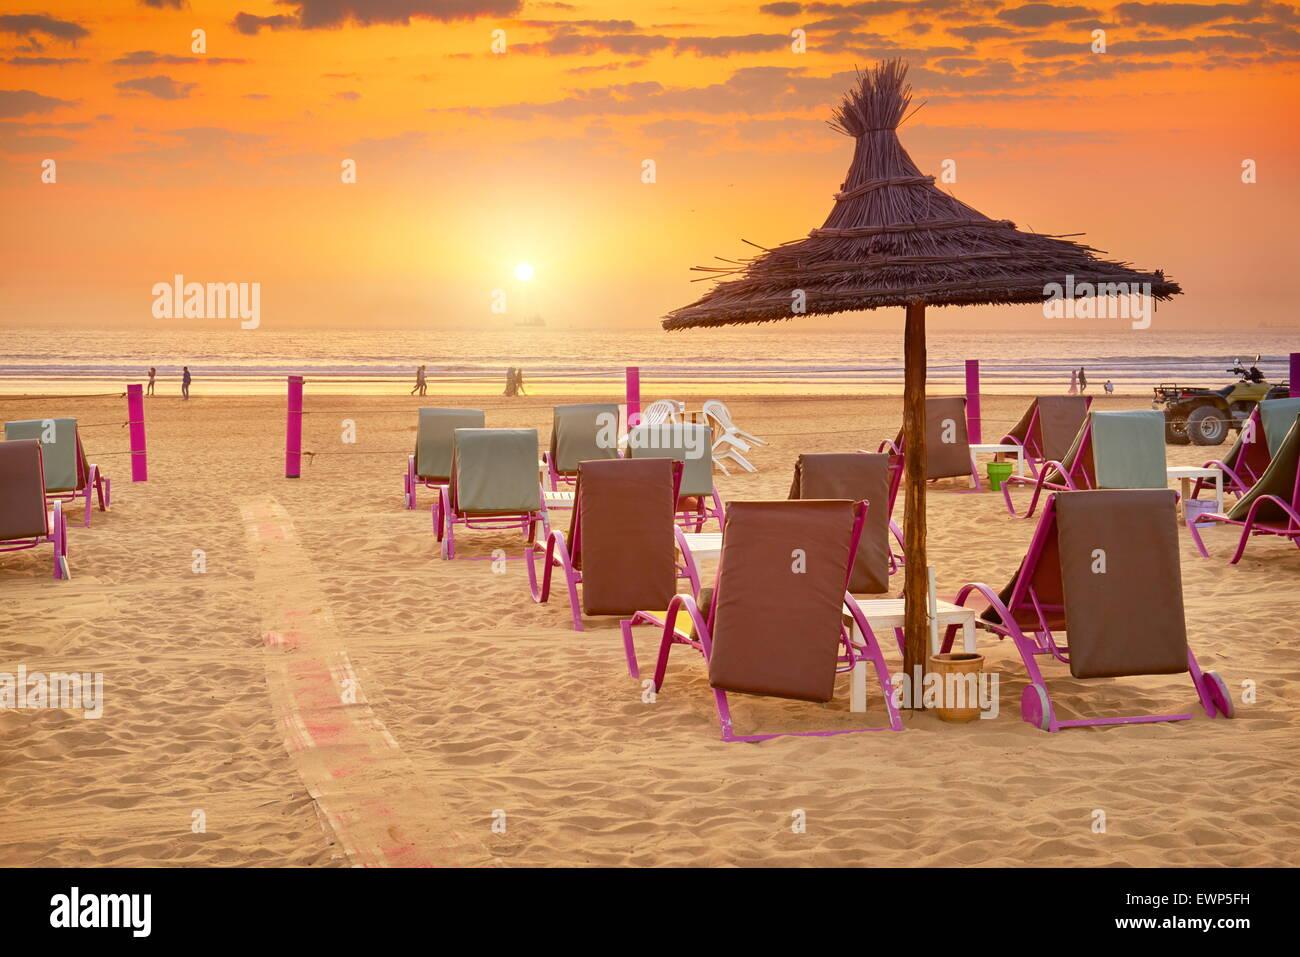 Agadir - Sonnenuntergang am Strand, Marokko Stockbild